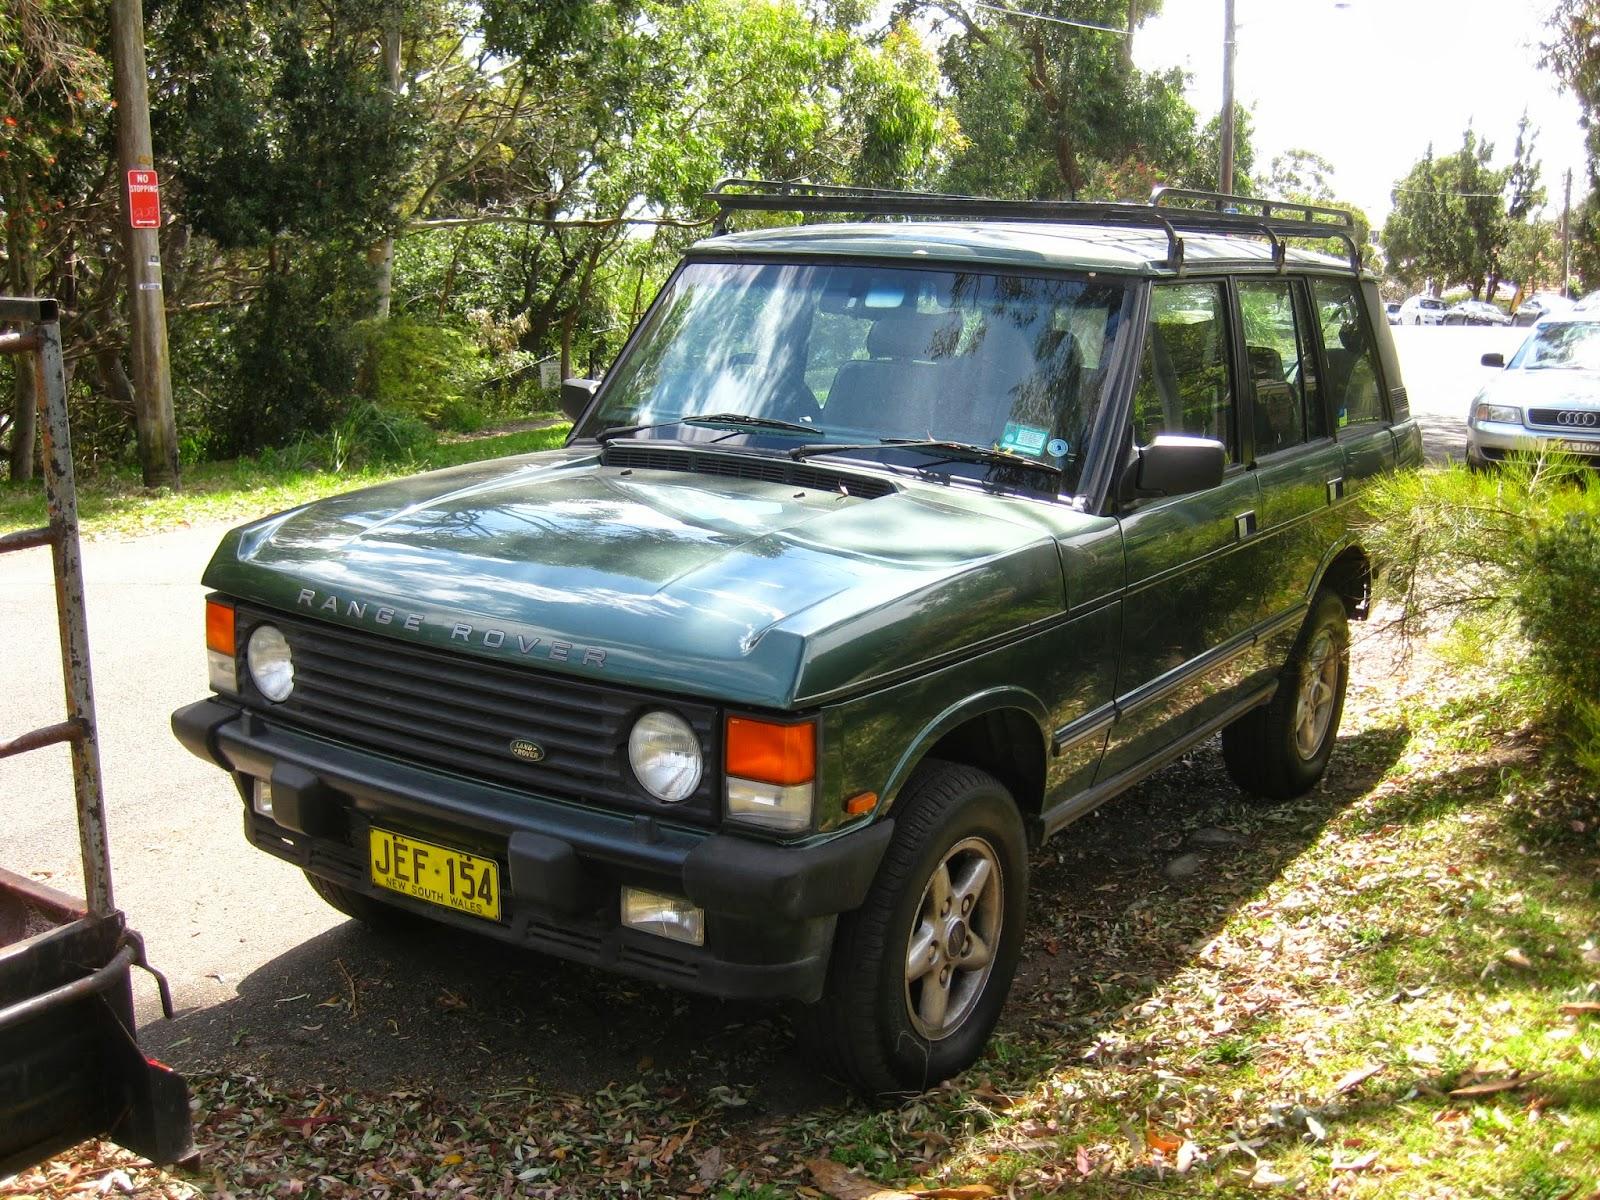 Aussie Old Parked Cars 1994 Range Rover Classic Vogue SE